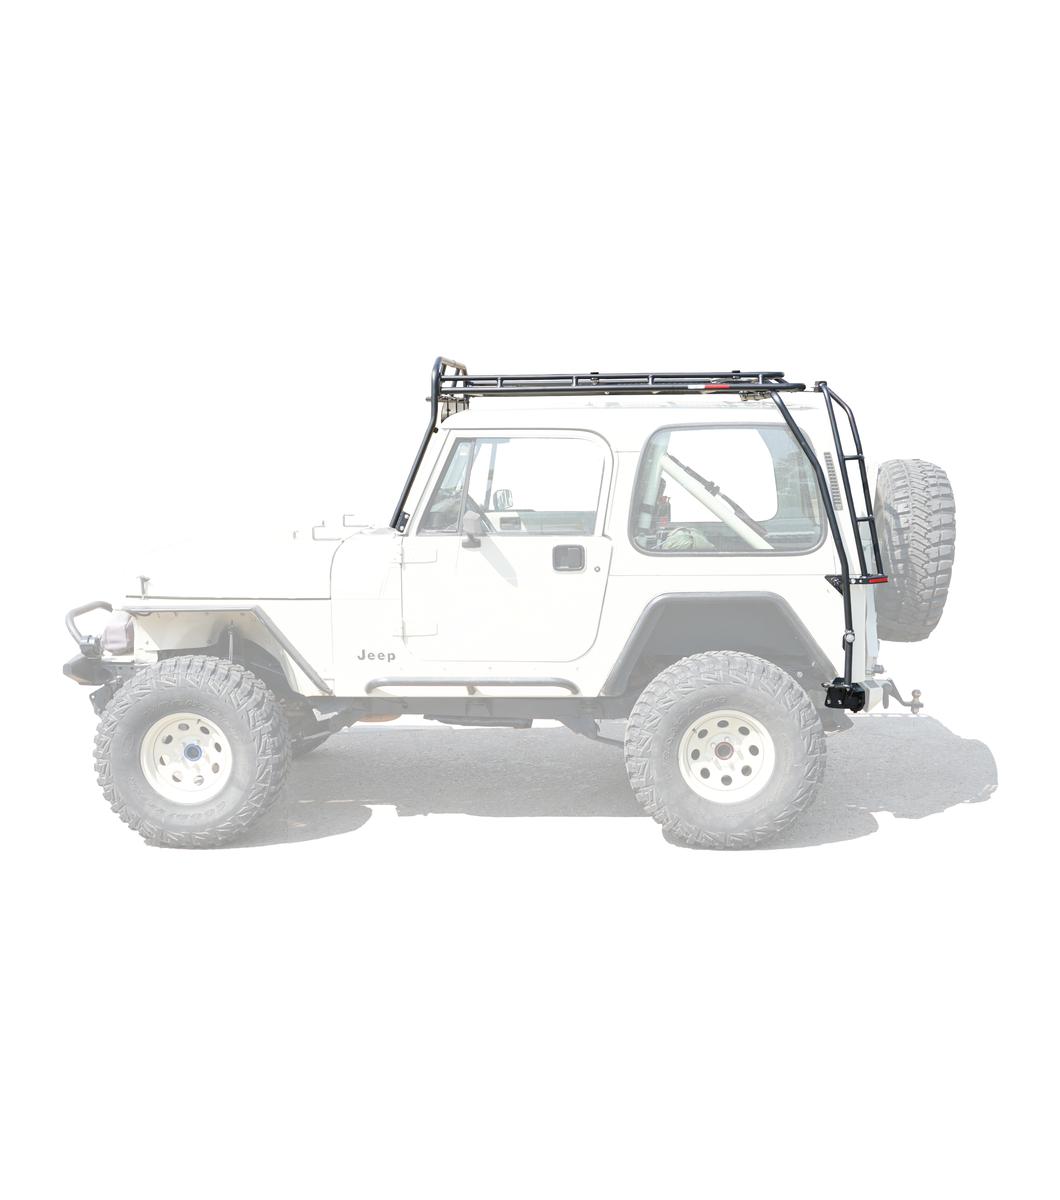 Gobi Jeep Yj Ranger Rack Multi Light Setup With Sunroof